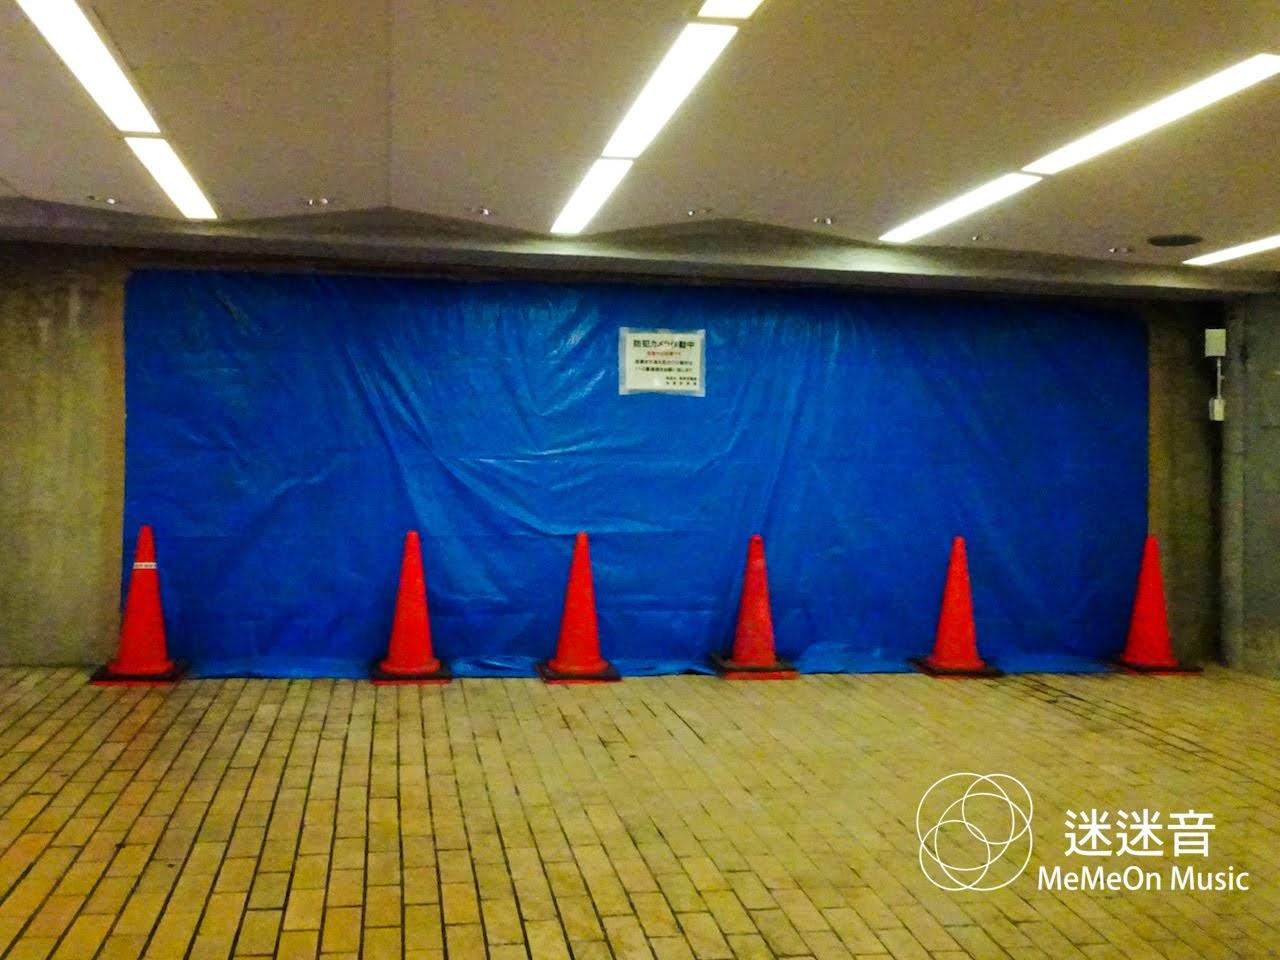 「WE ROAD」地下通道被蓋起來的壁畫